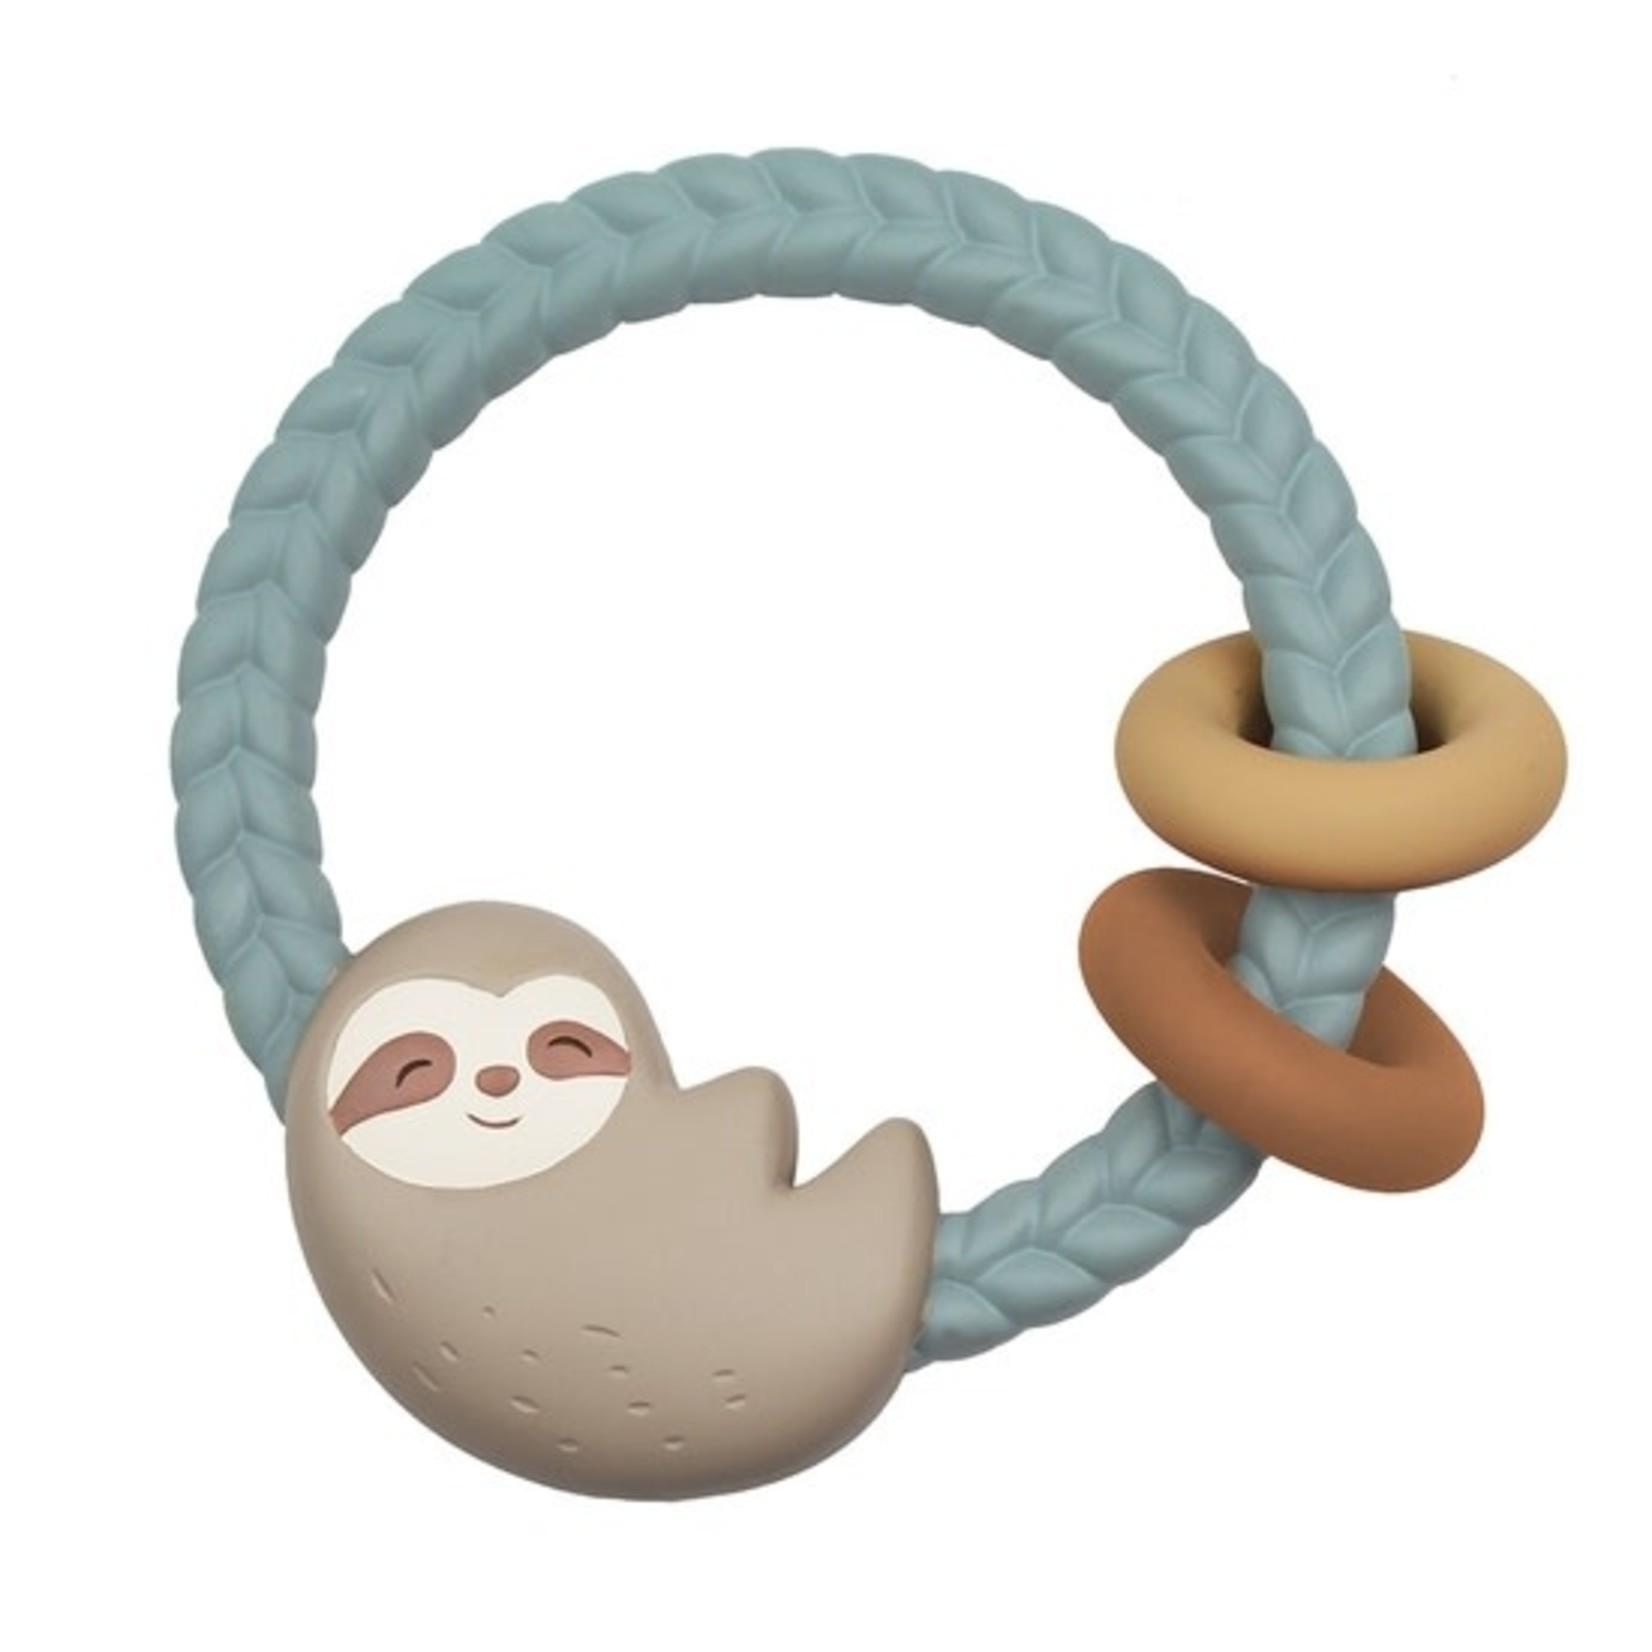 Itzy Ritzy Ritzy Rattle Sloth